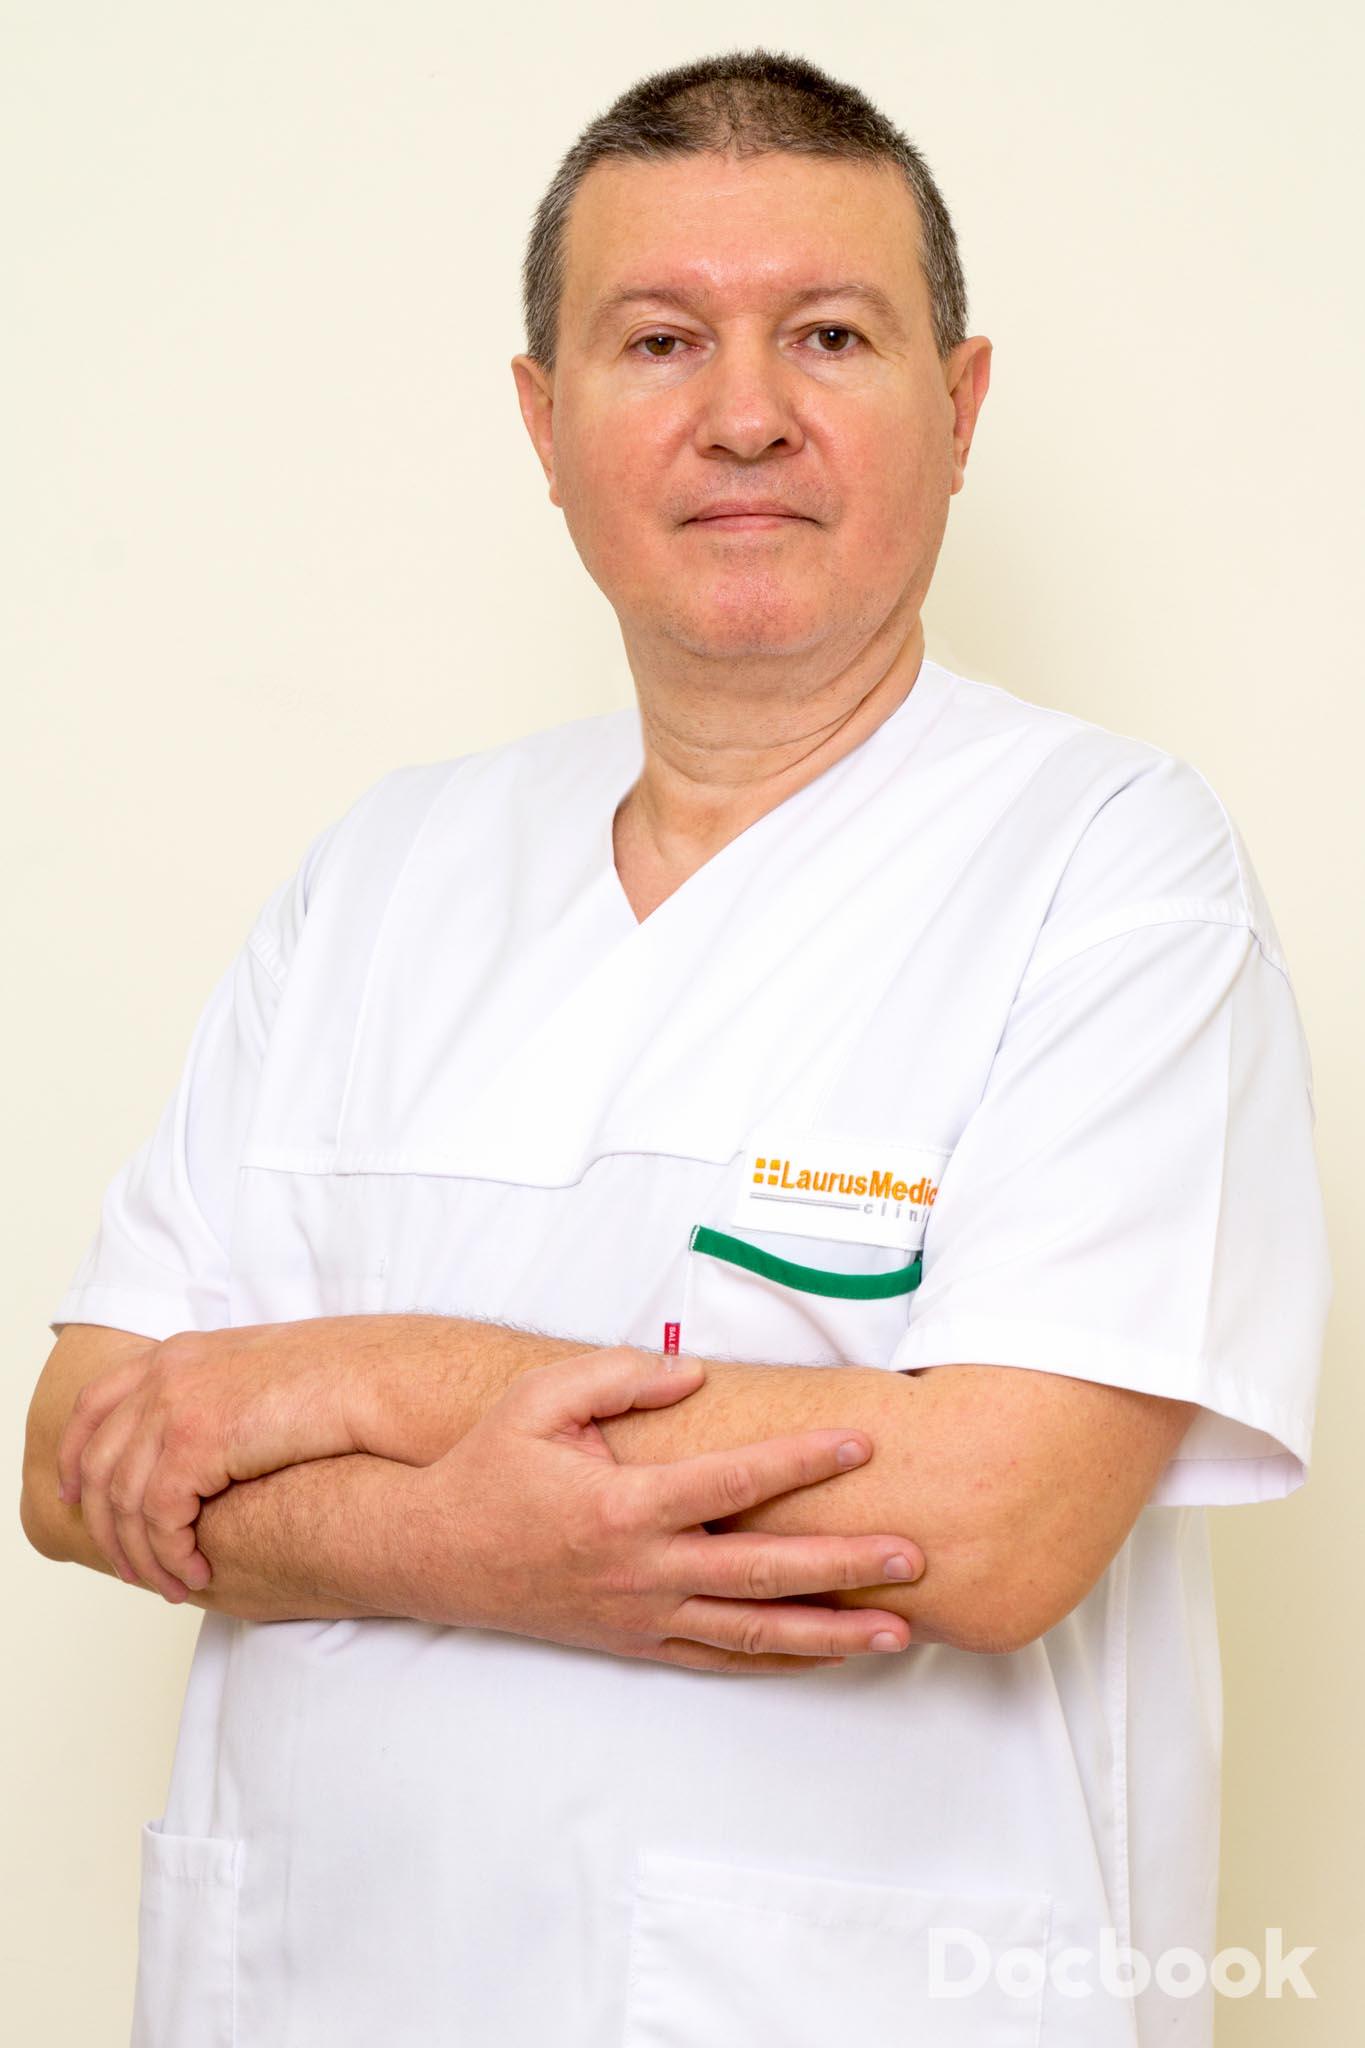 Dr. Aurelian Sfetcu